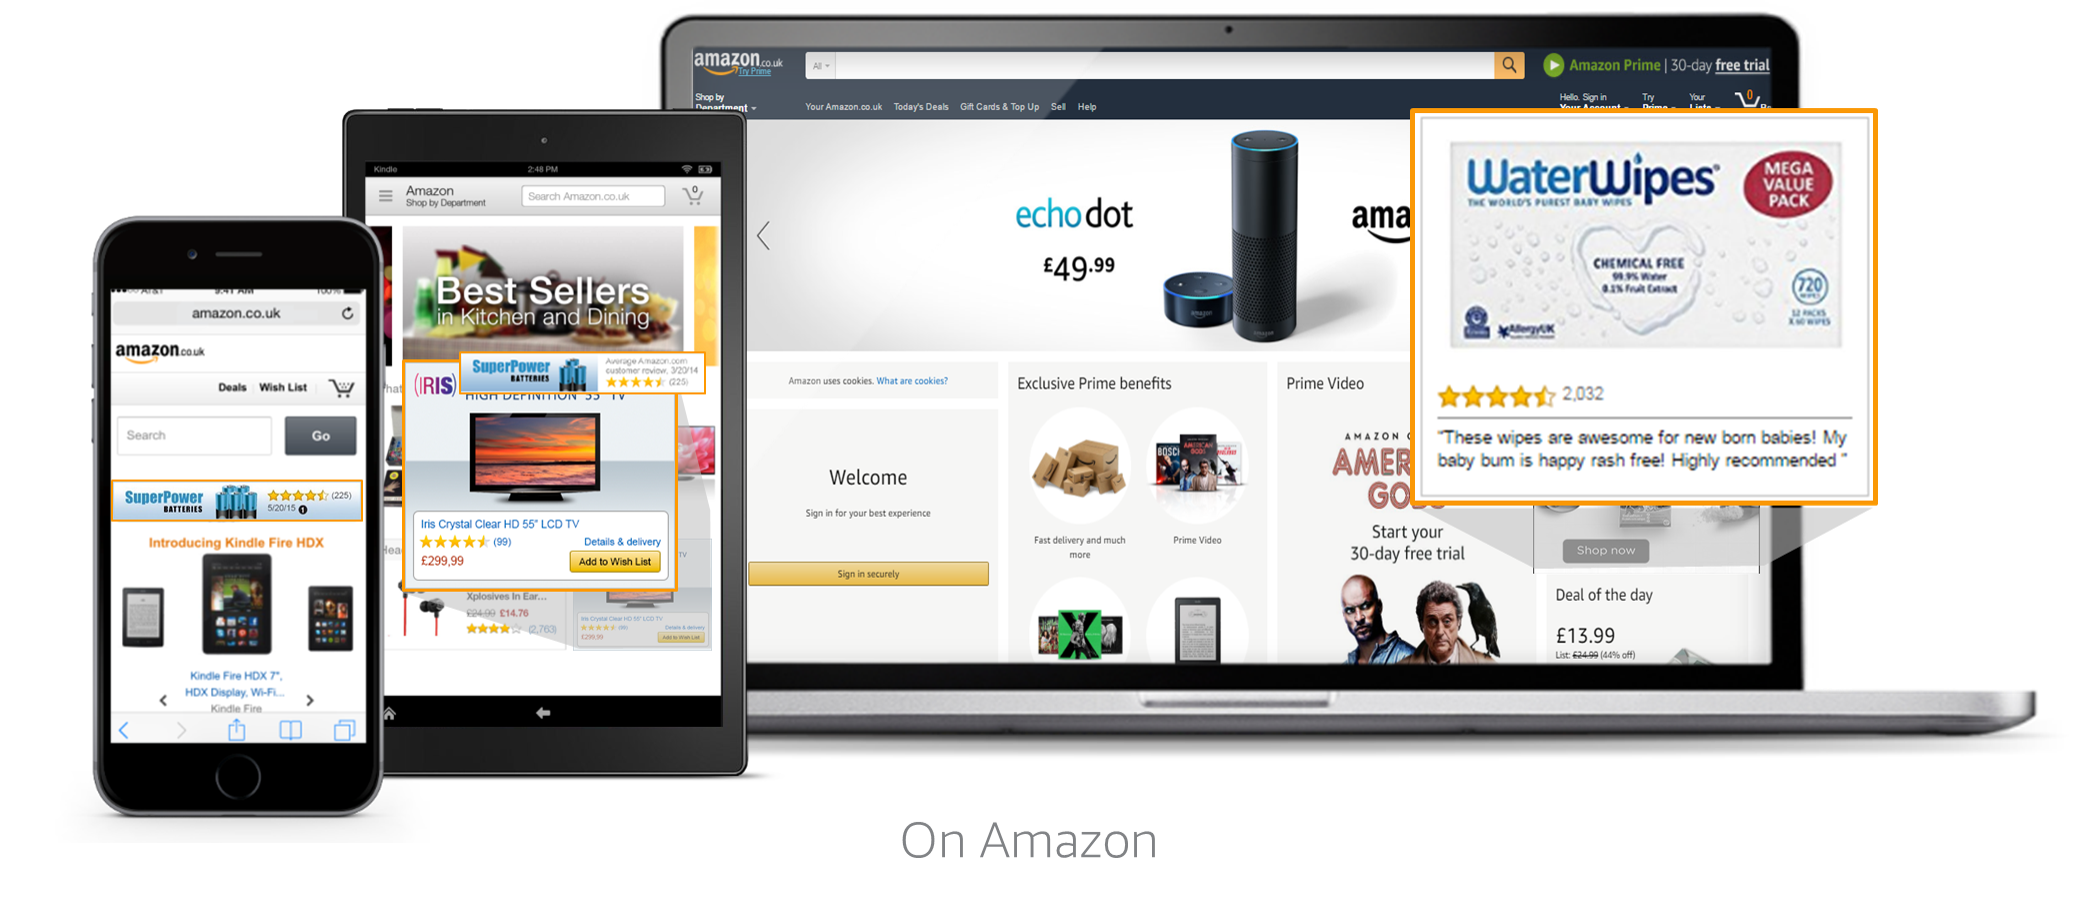 On Amazon.com